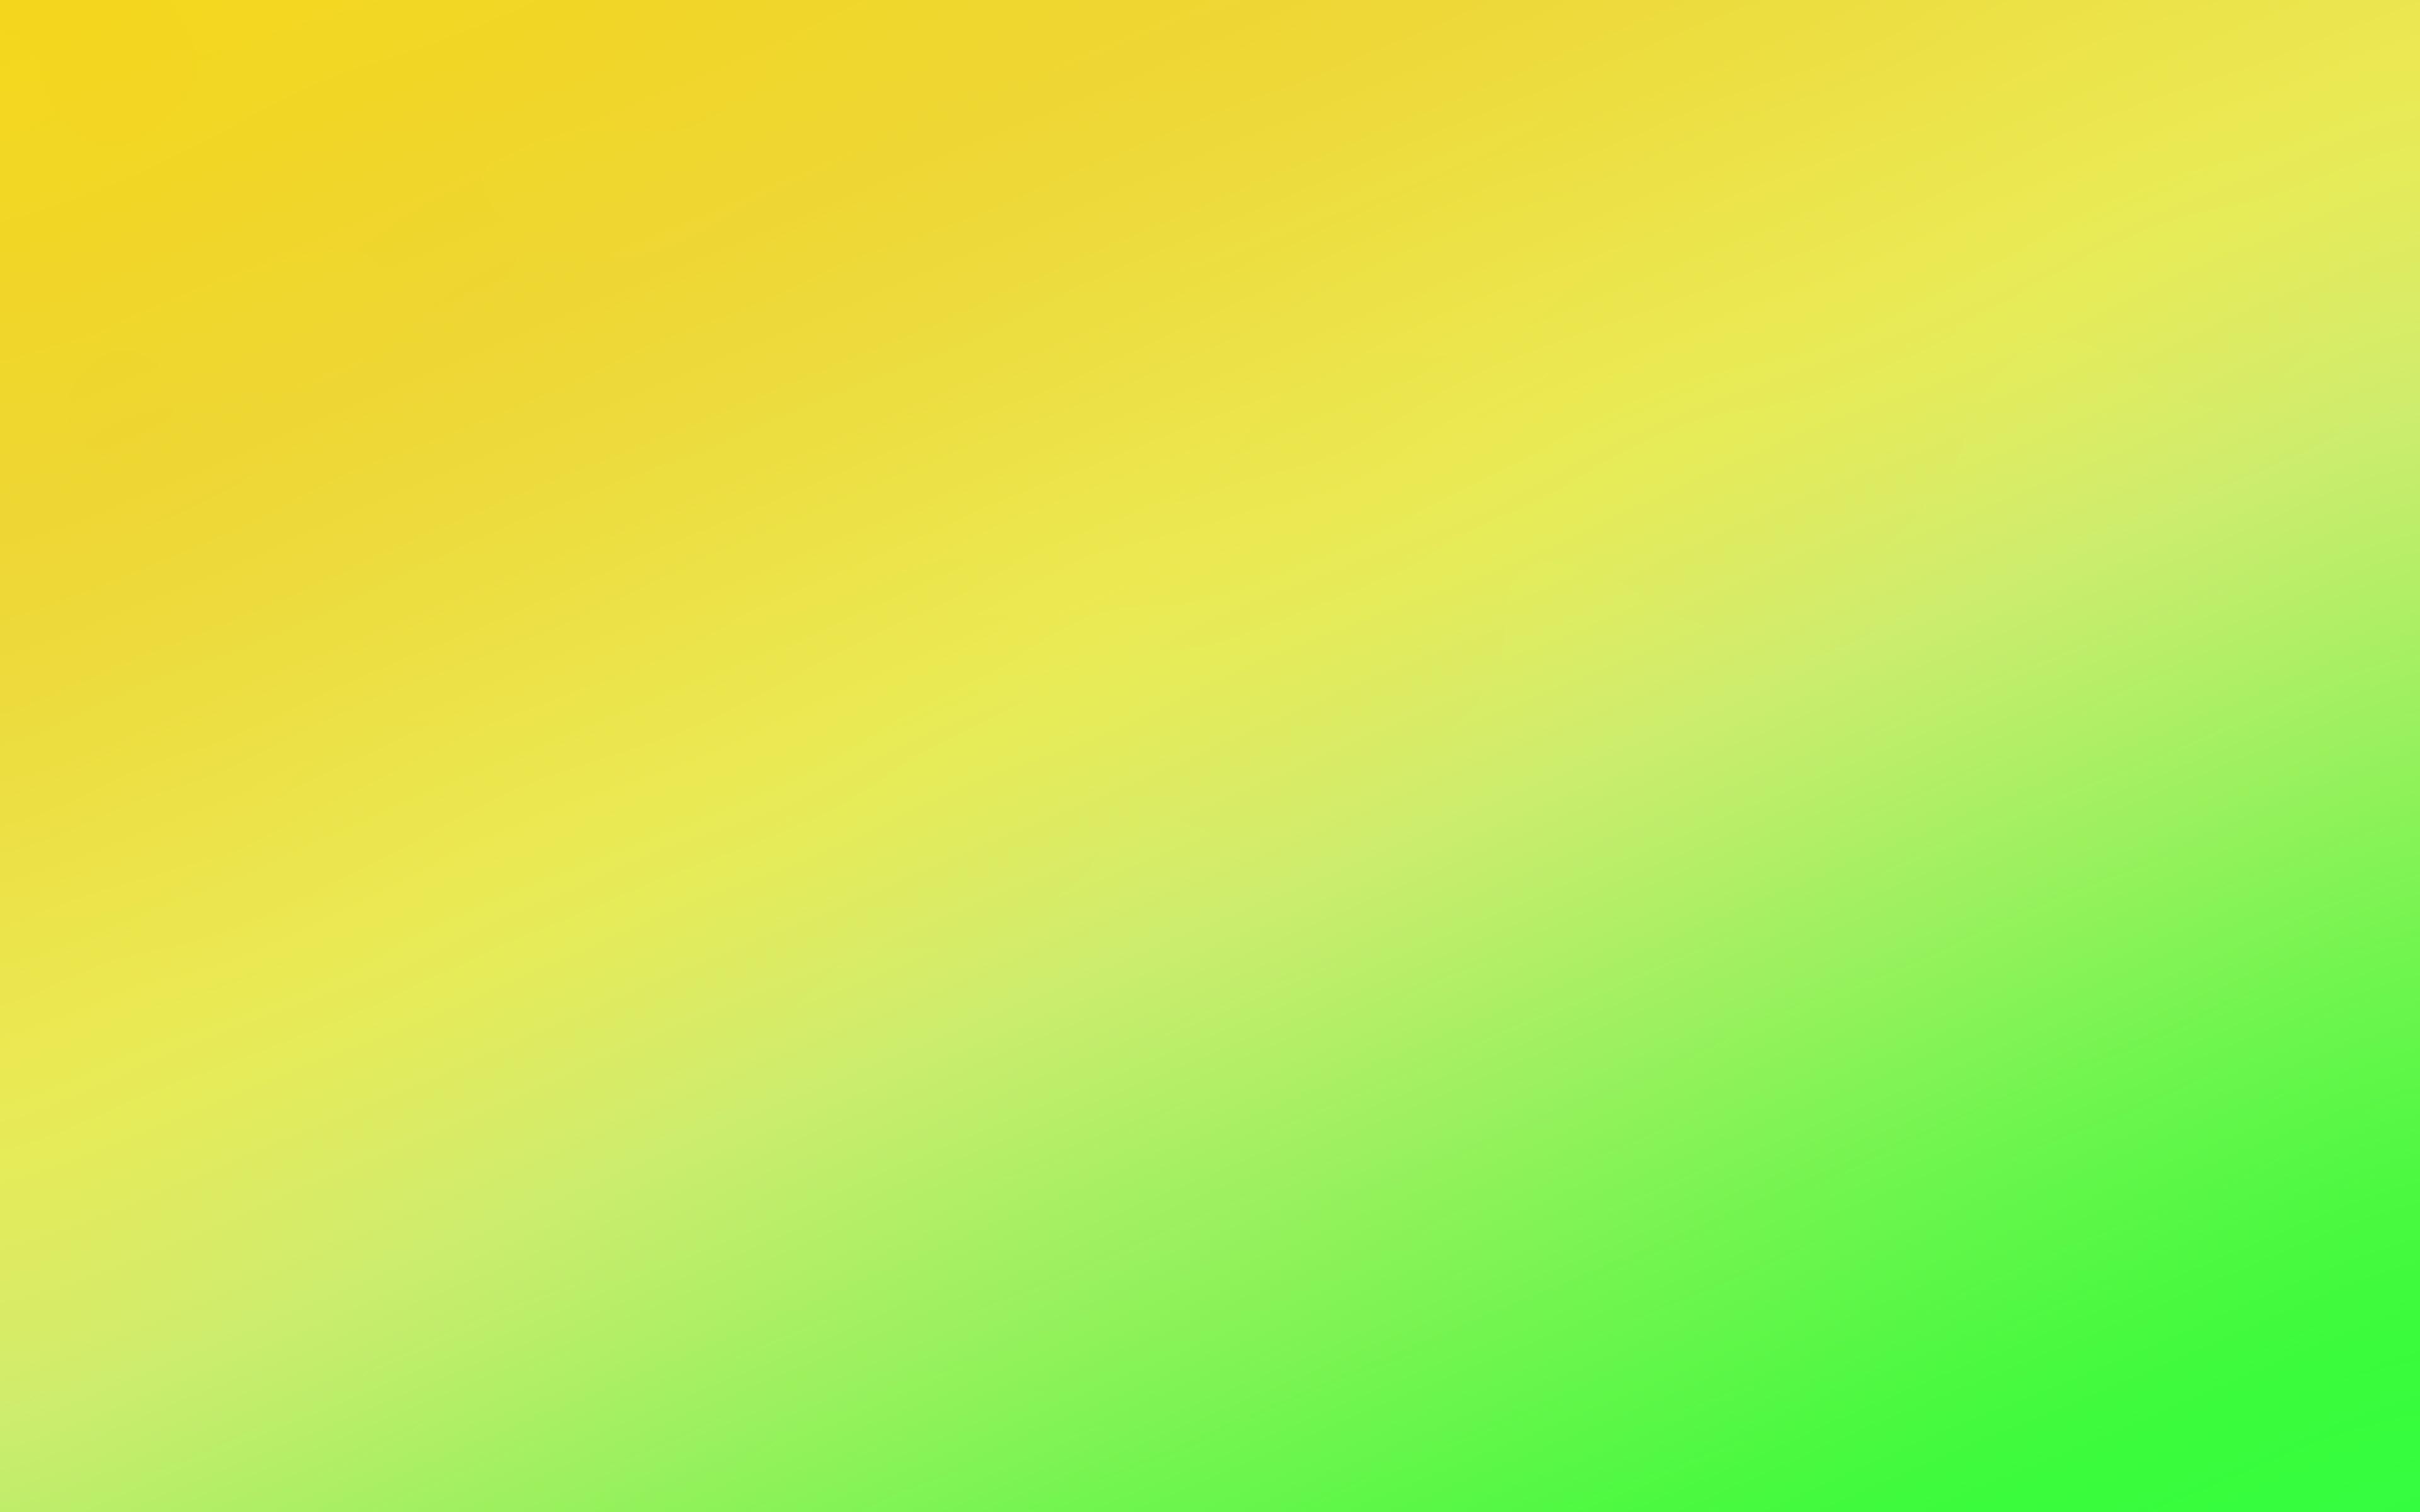 sl79-yellow-green-blur-gradation-wallpaper